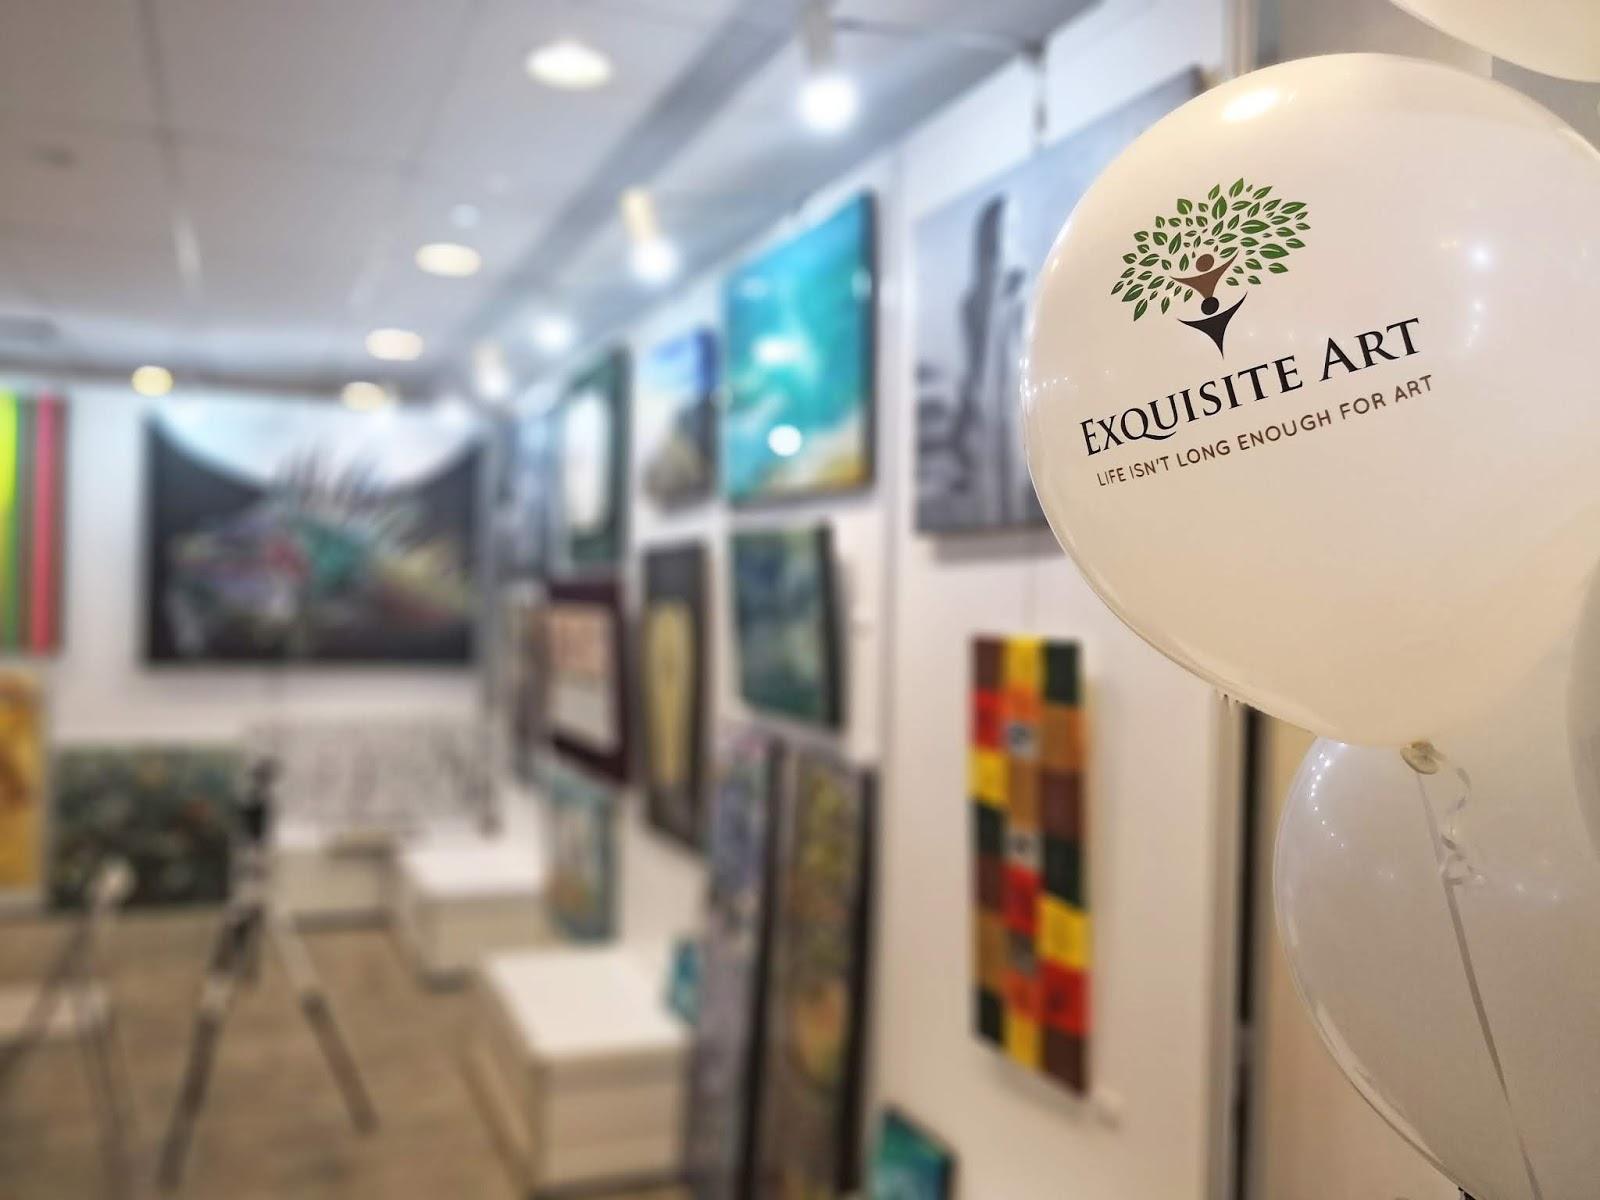 Tatinis Art Show 2018 – A Love Affair with Art